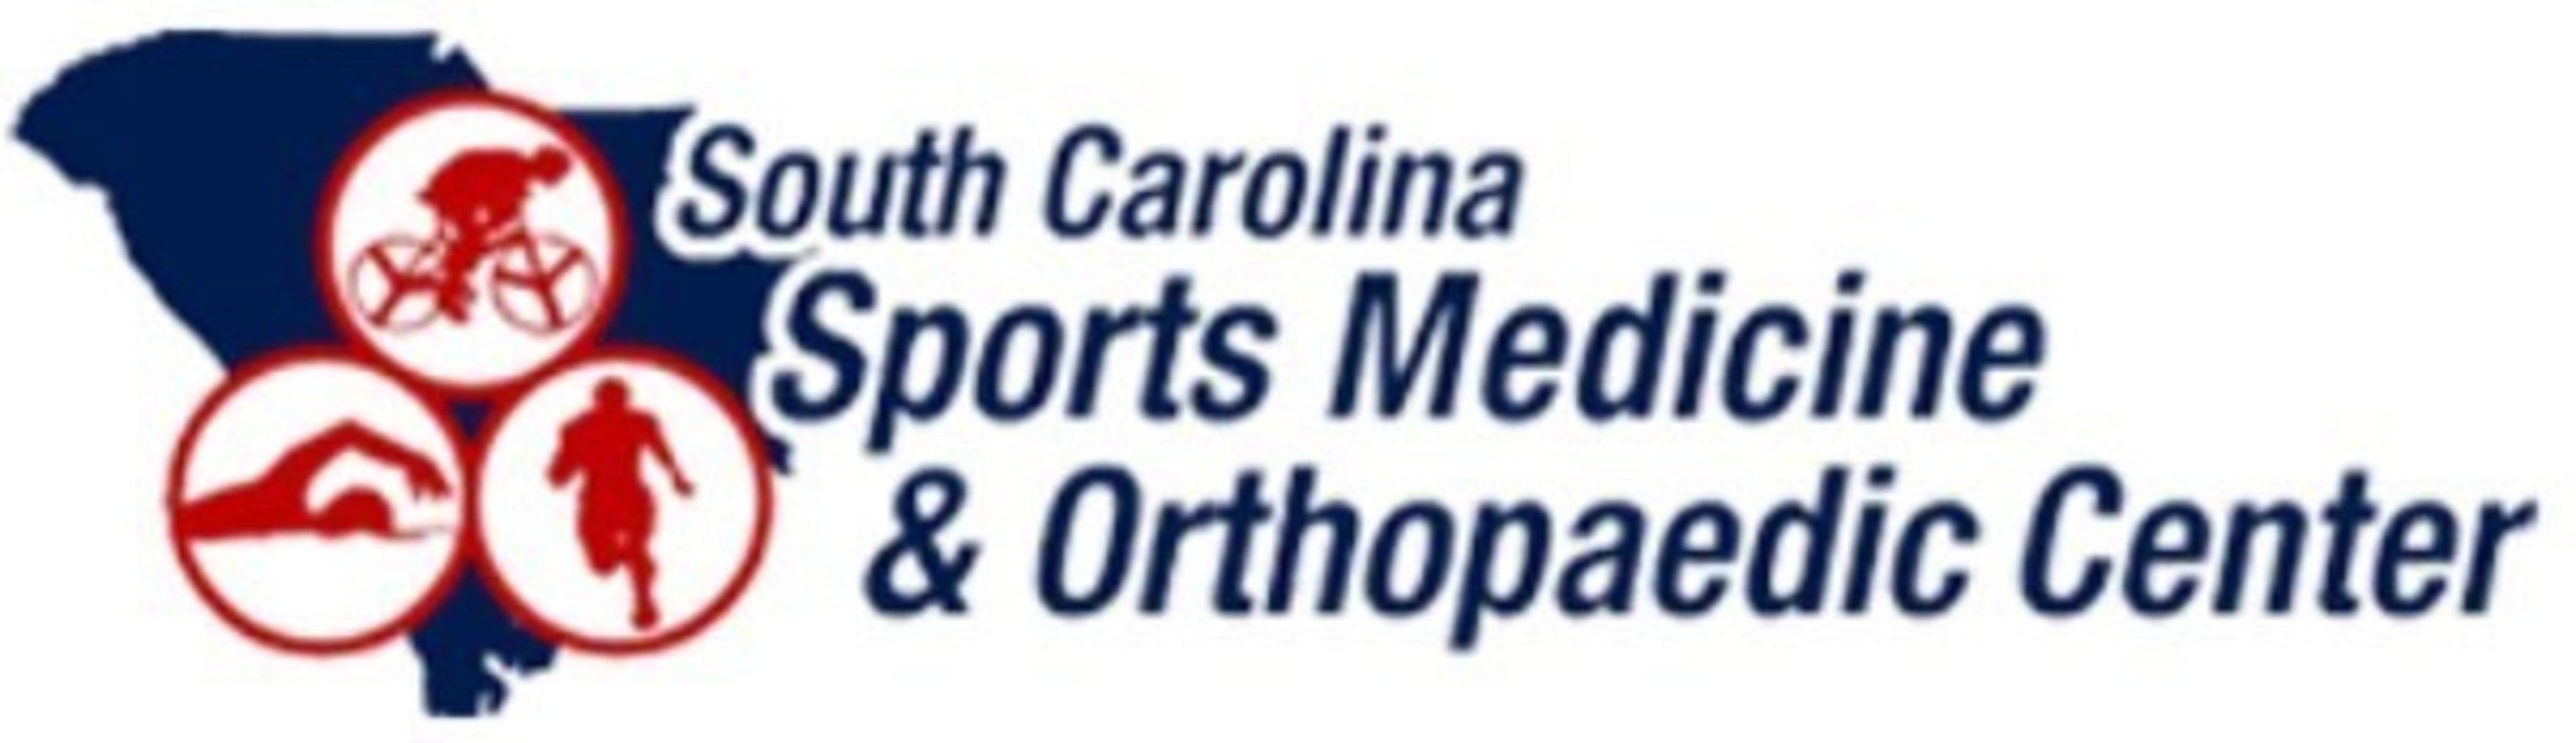 South Carolina Sports Medicine & Orthopedic Center